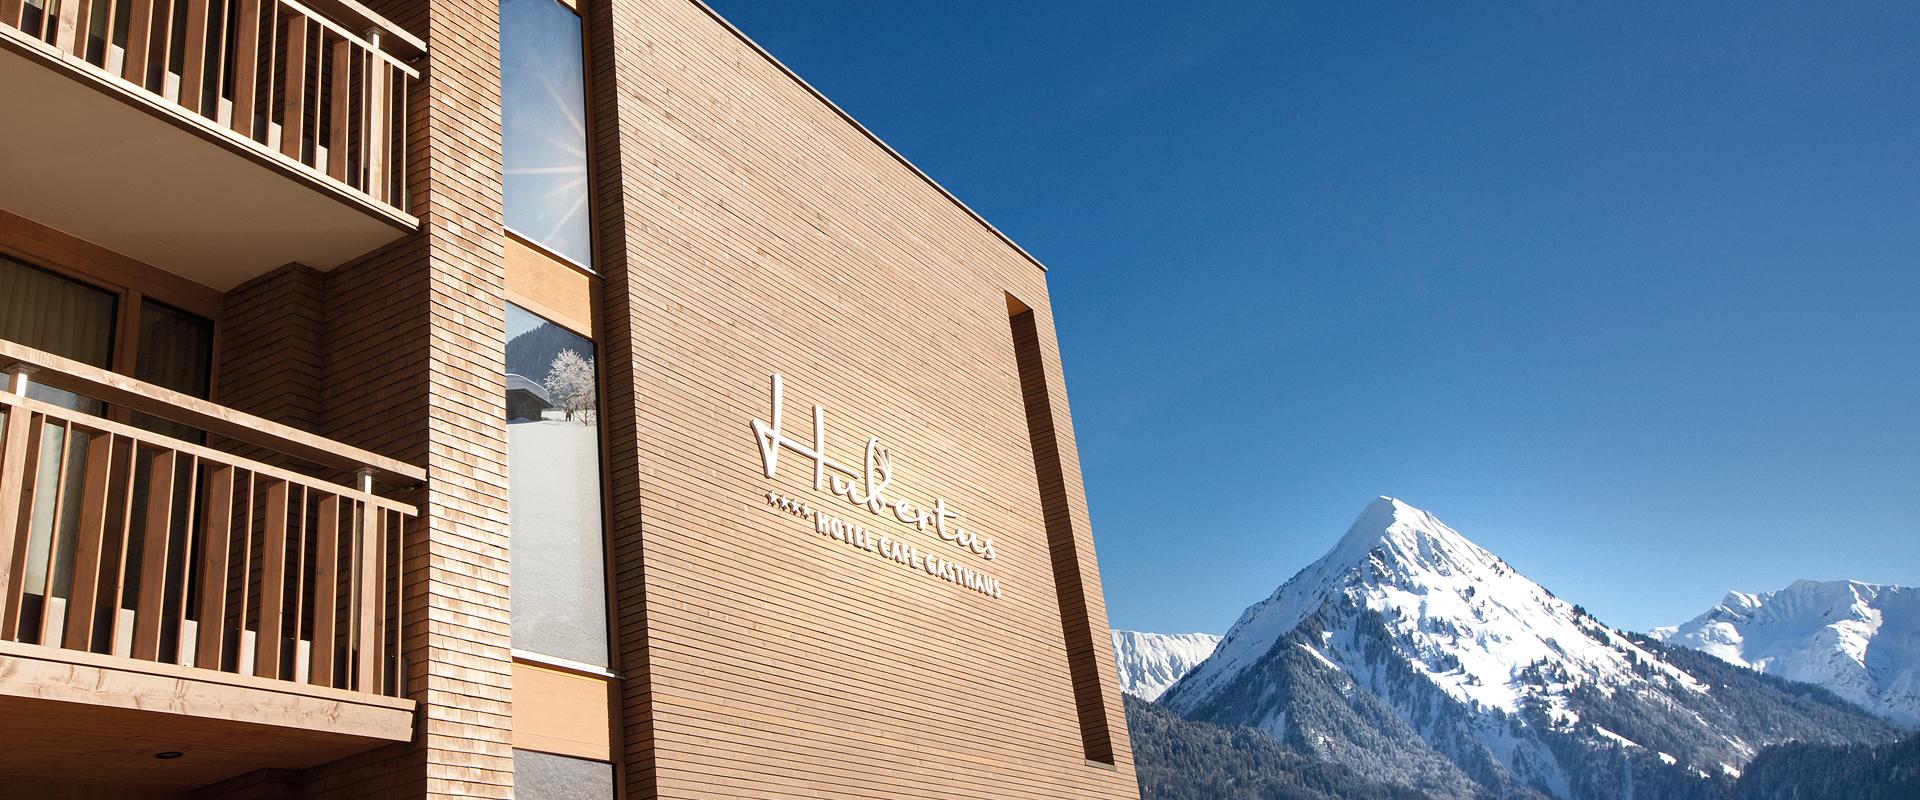 Hotel Hubertus Bild1